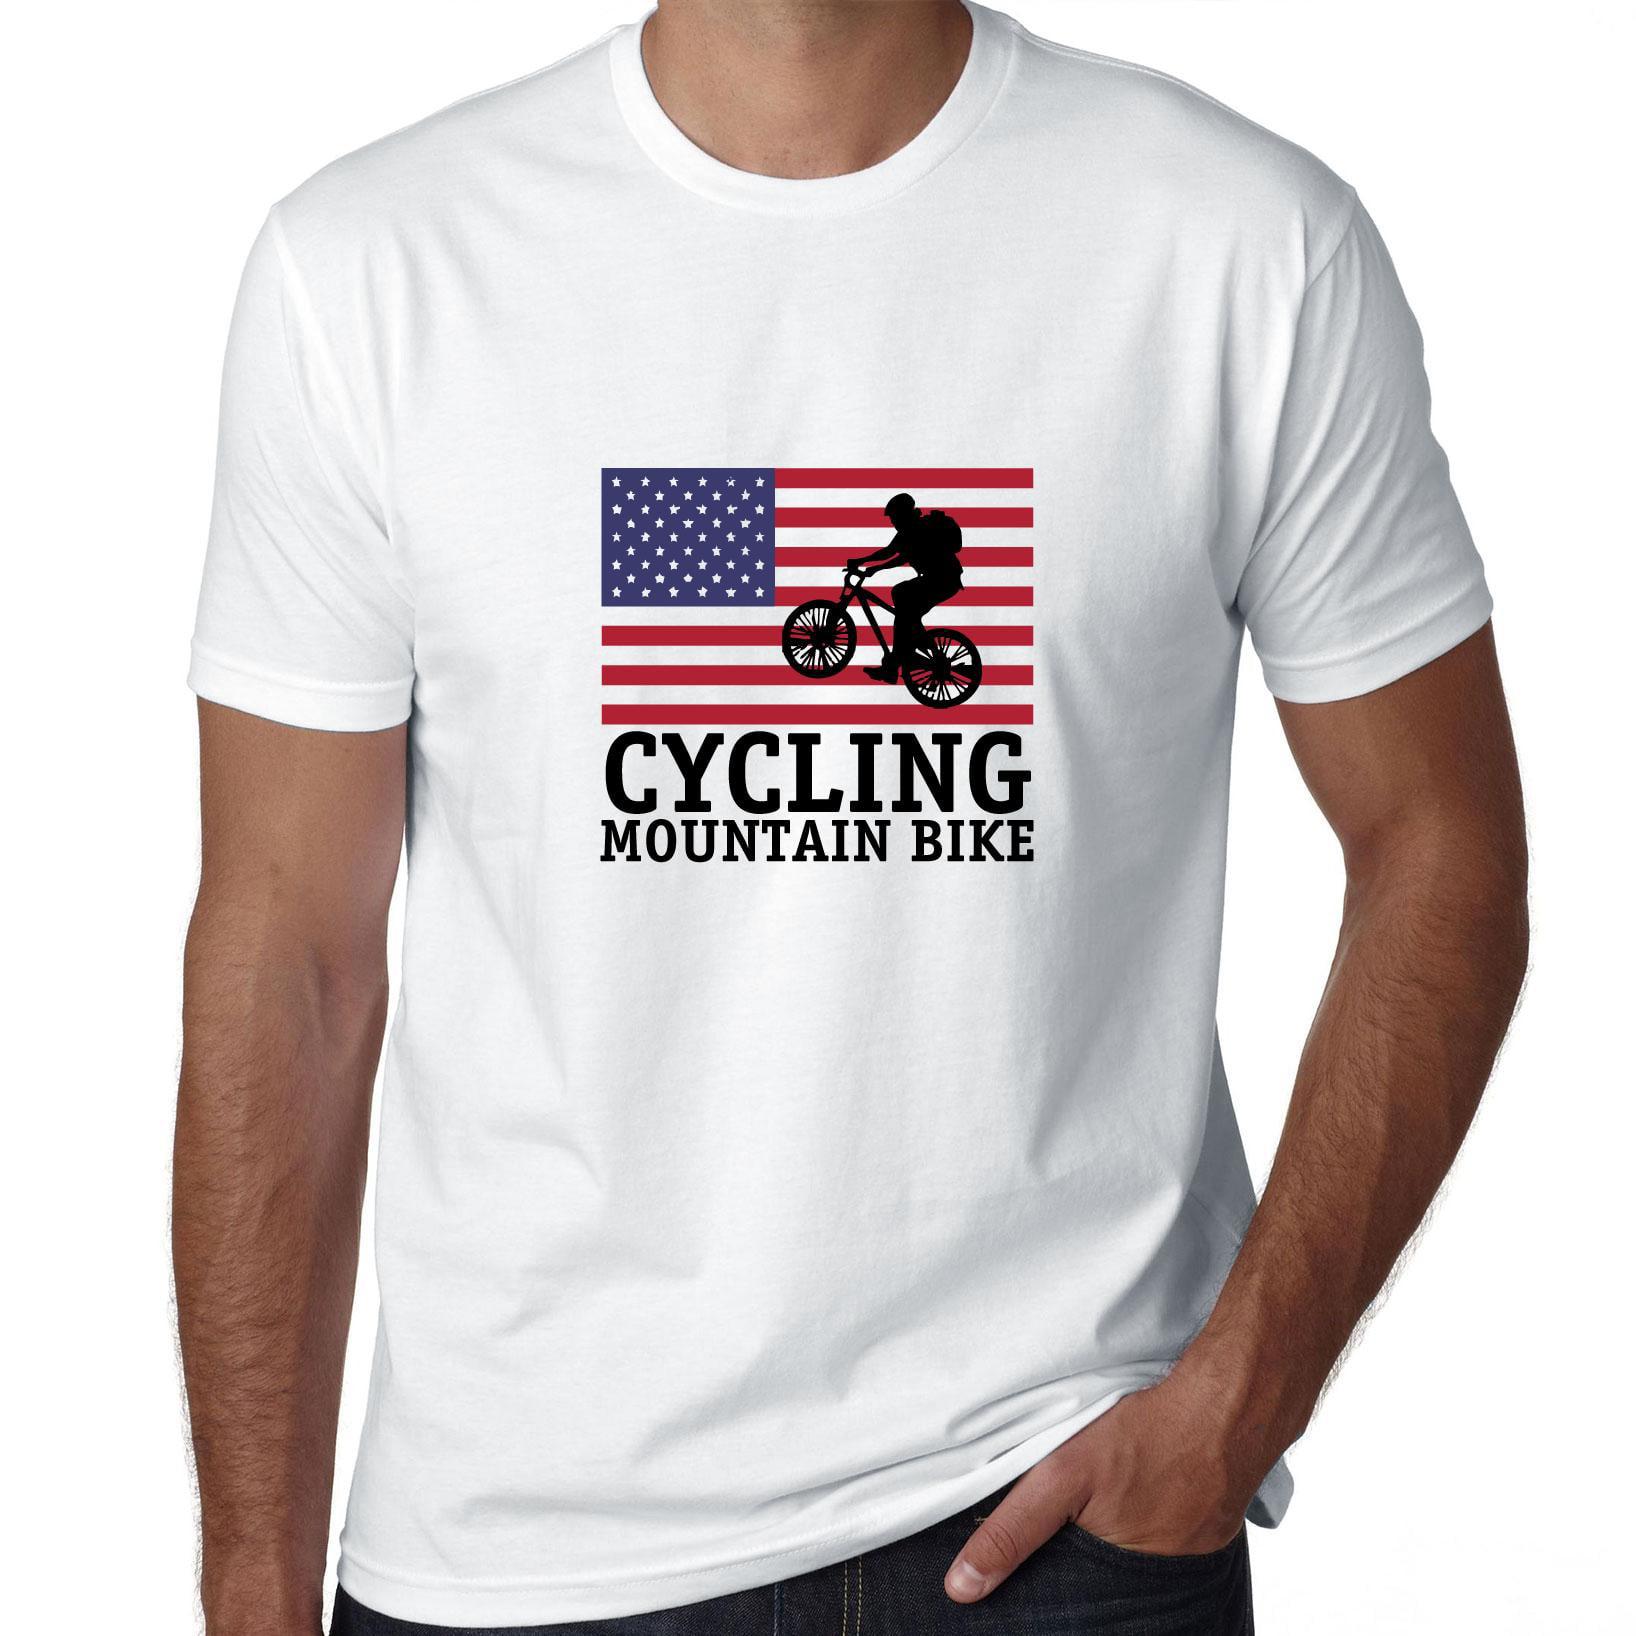 Hanes Tagless Tee T-Shirt Ride Mtb Mountain Biking